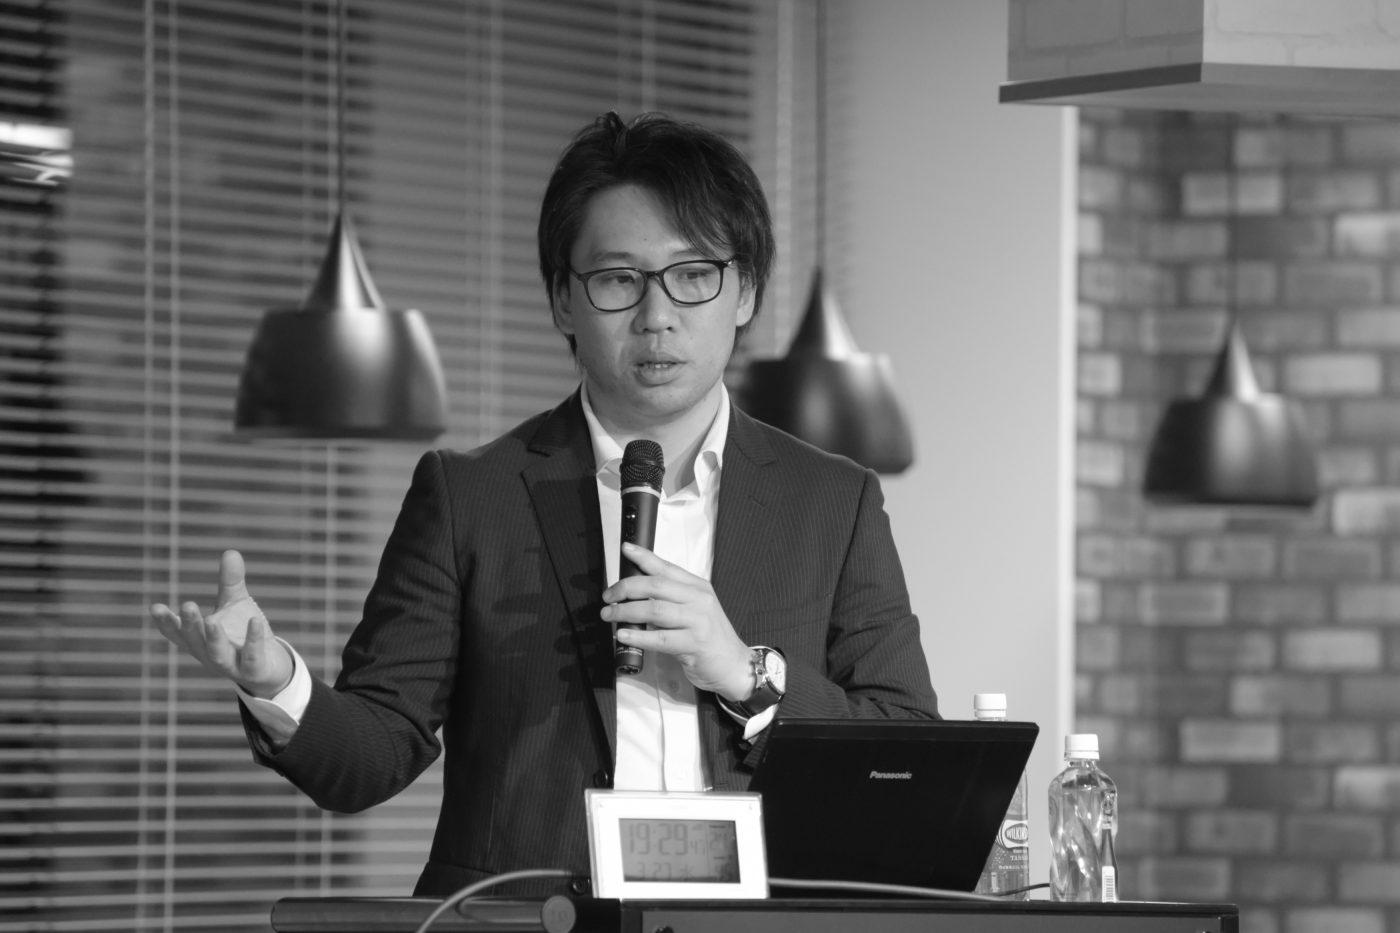 MaaSという大きな潮流の中で「つるはし」はどこにあるか MaaS Tech Japan 代表 日高洋祐